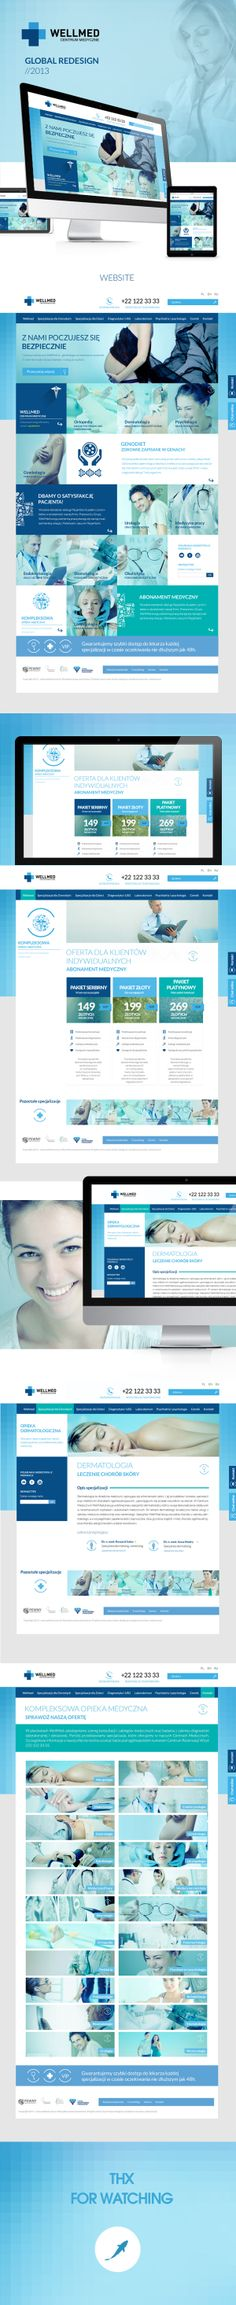 Wellmed - Centrum Medyczne by Tomasz Trefler, via Behance #medical #website #design